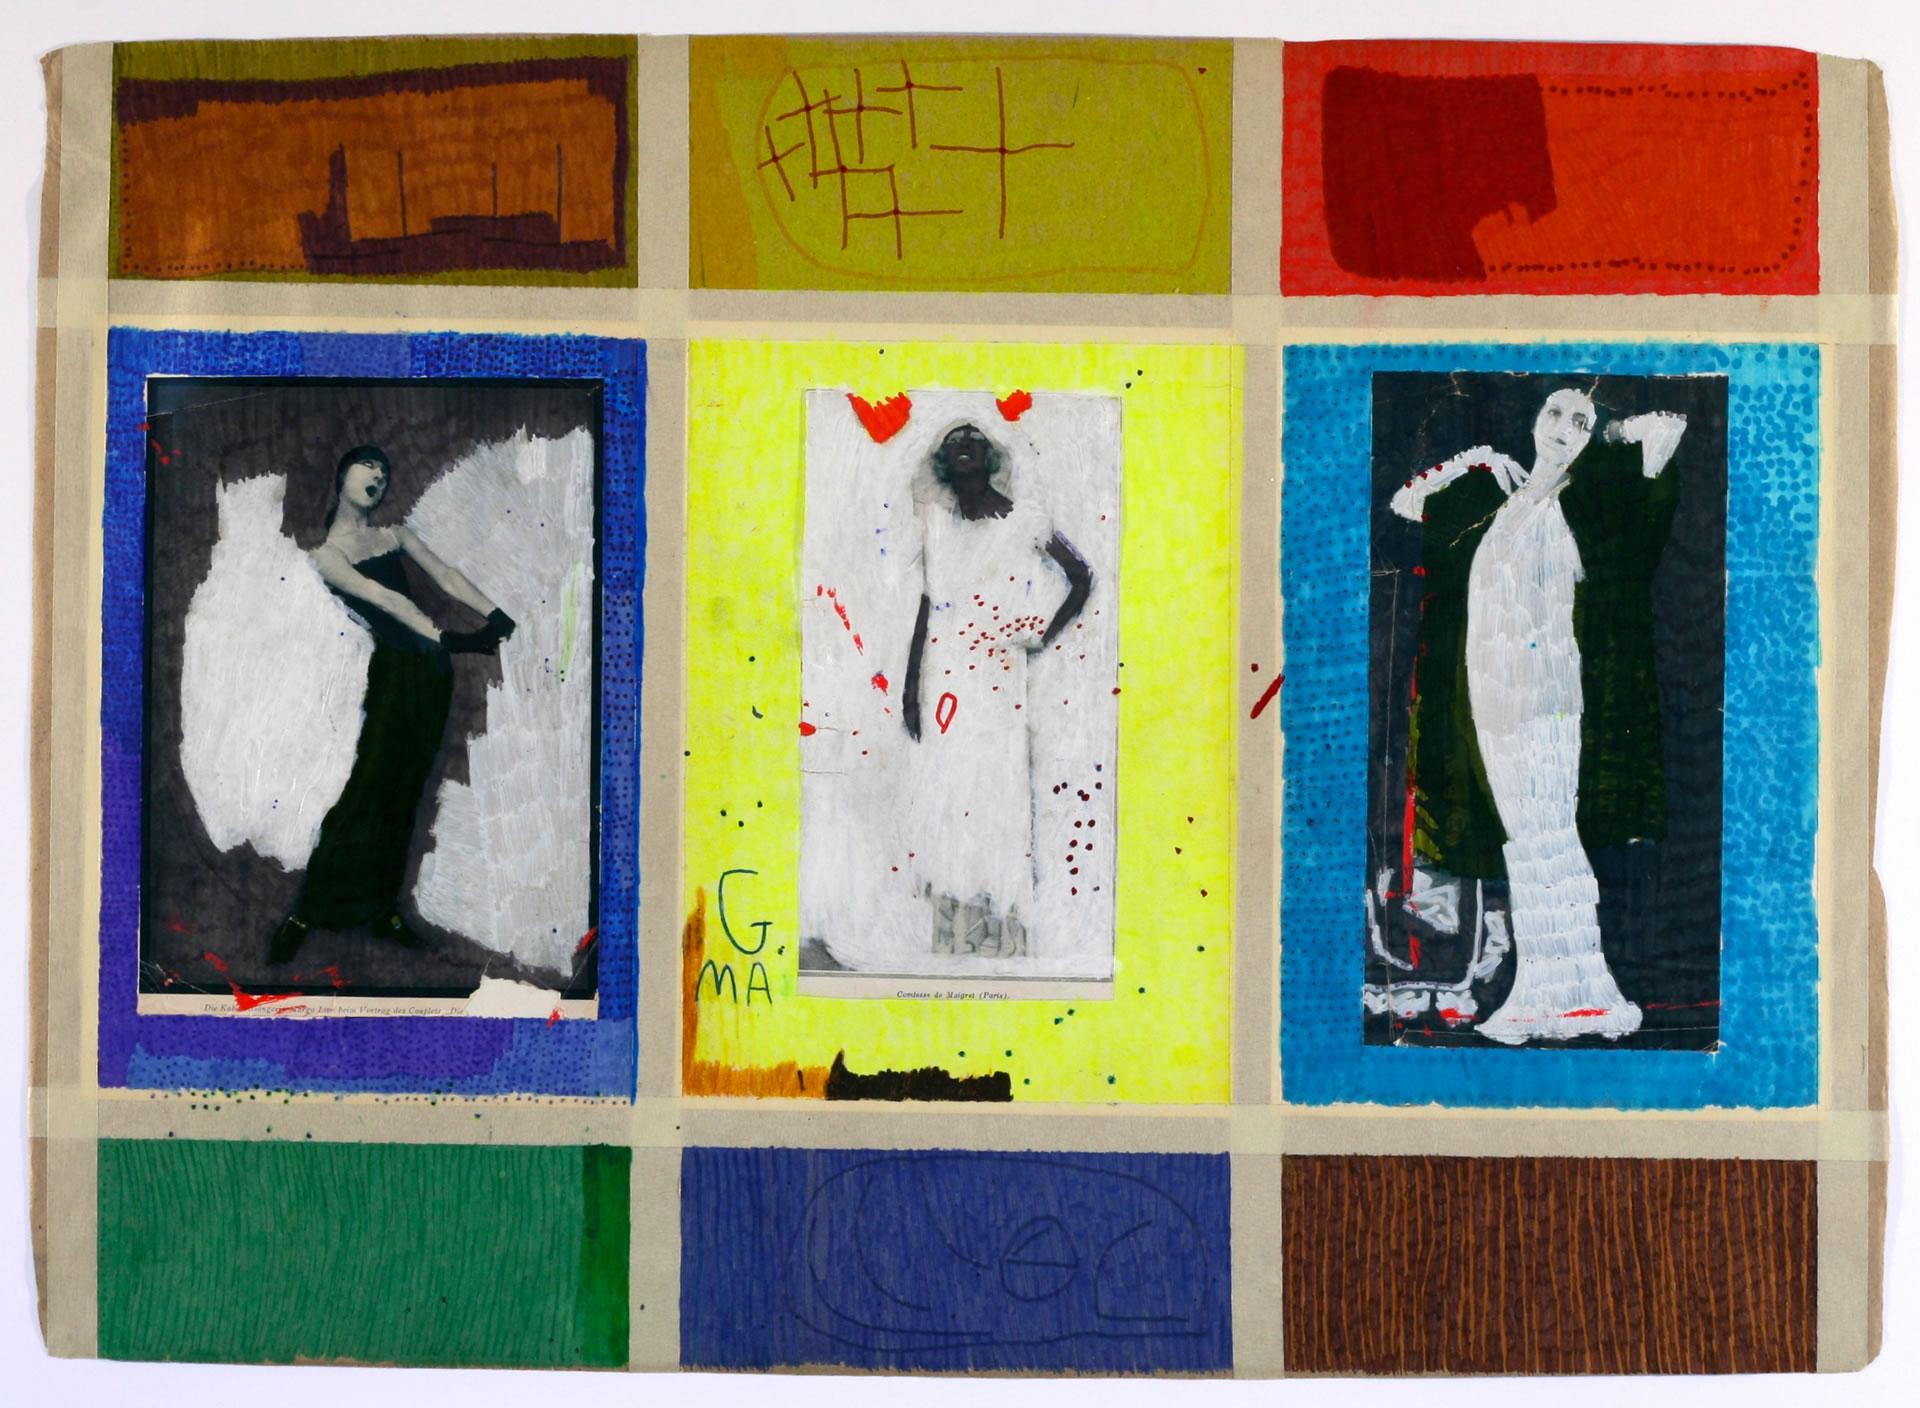 Galerie3 | Kopfkino | 16 | Magid Ajjane